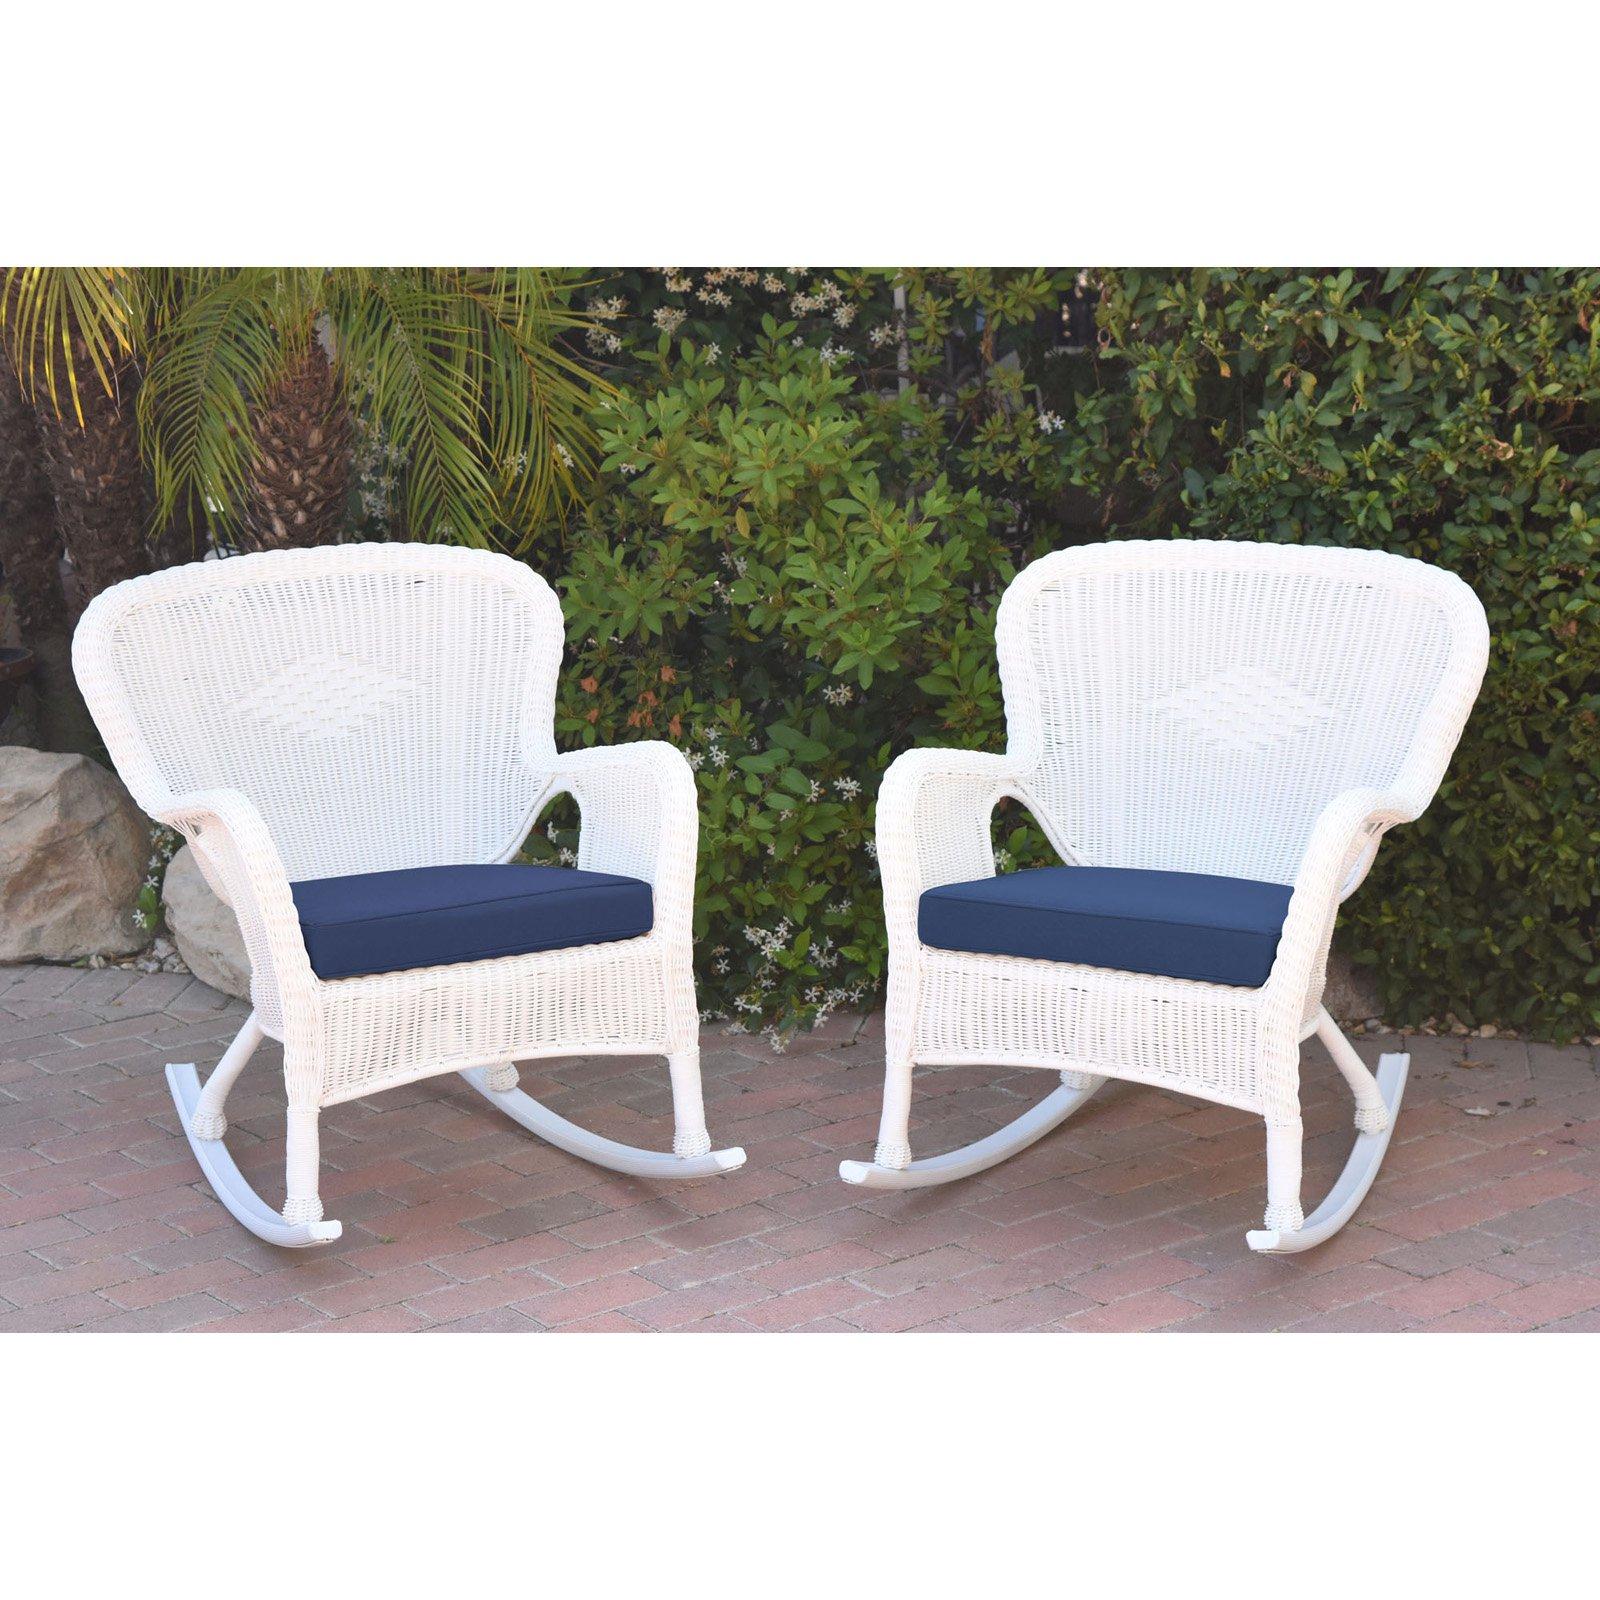 Jeco Windsor Resin Wicker Outdoor Rocking Chair - Set of 2